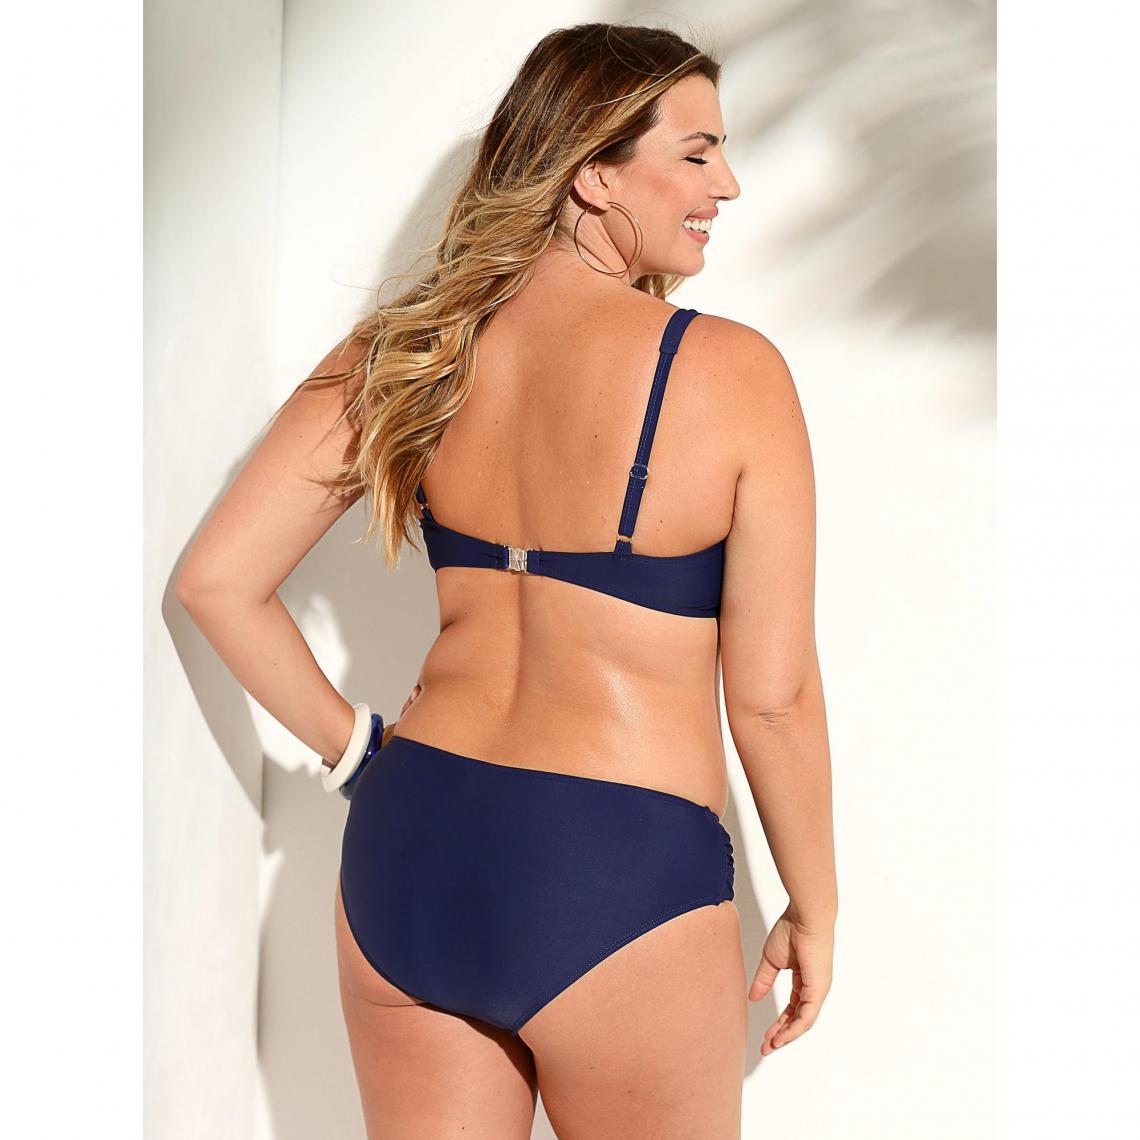 eb65364b442c2 Bikini uni bandeau et culotte taille haute femme Exclusivité ...